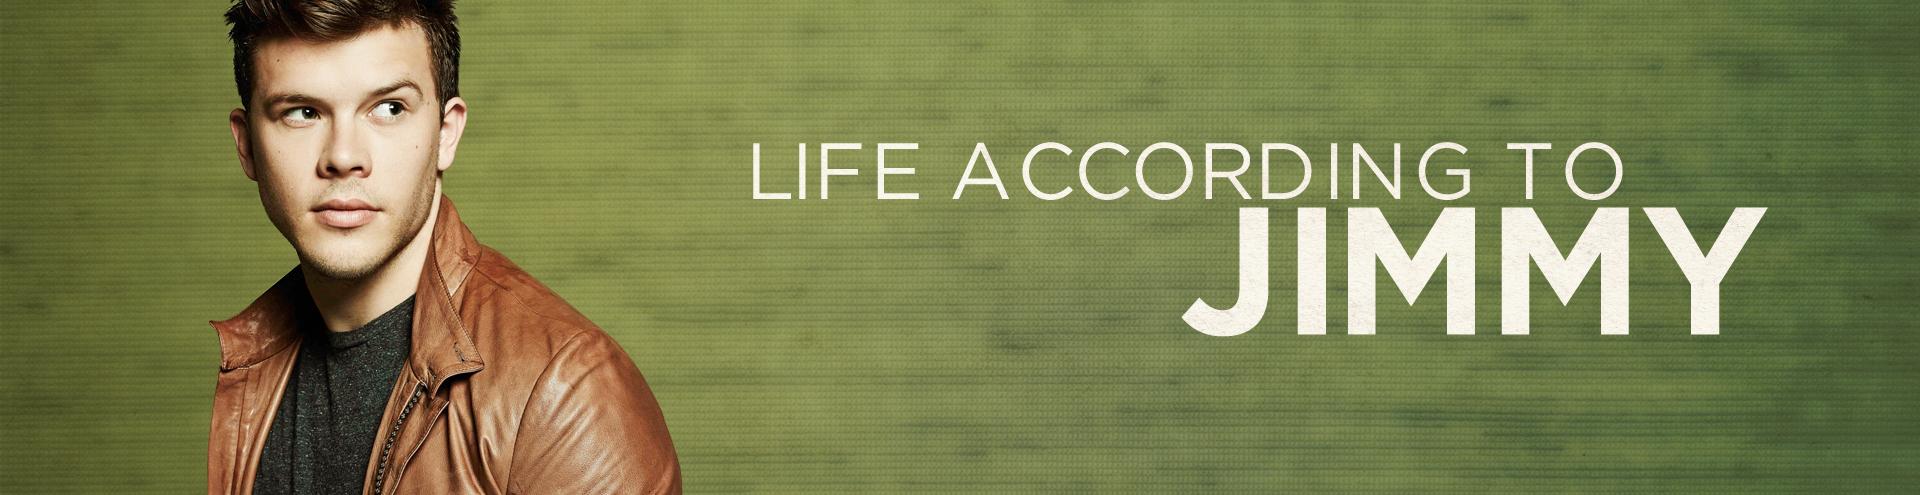 LifeAccordingToJimmy Official Store Store